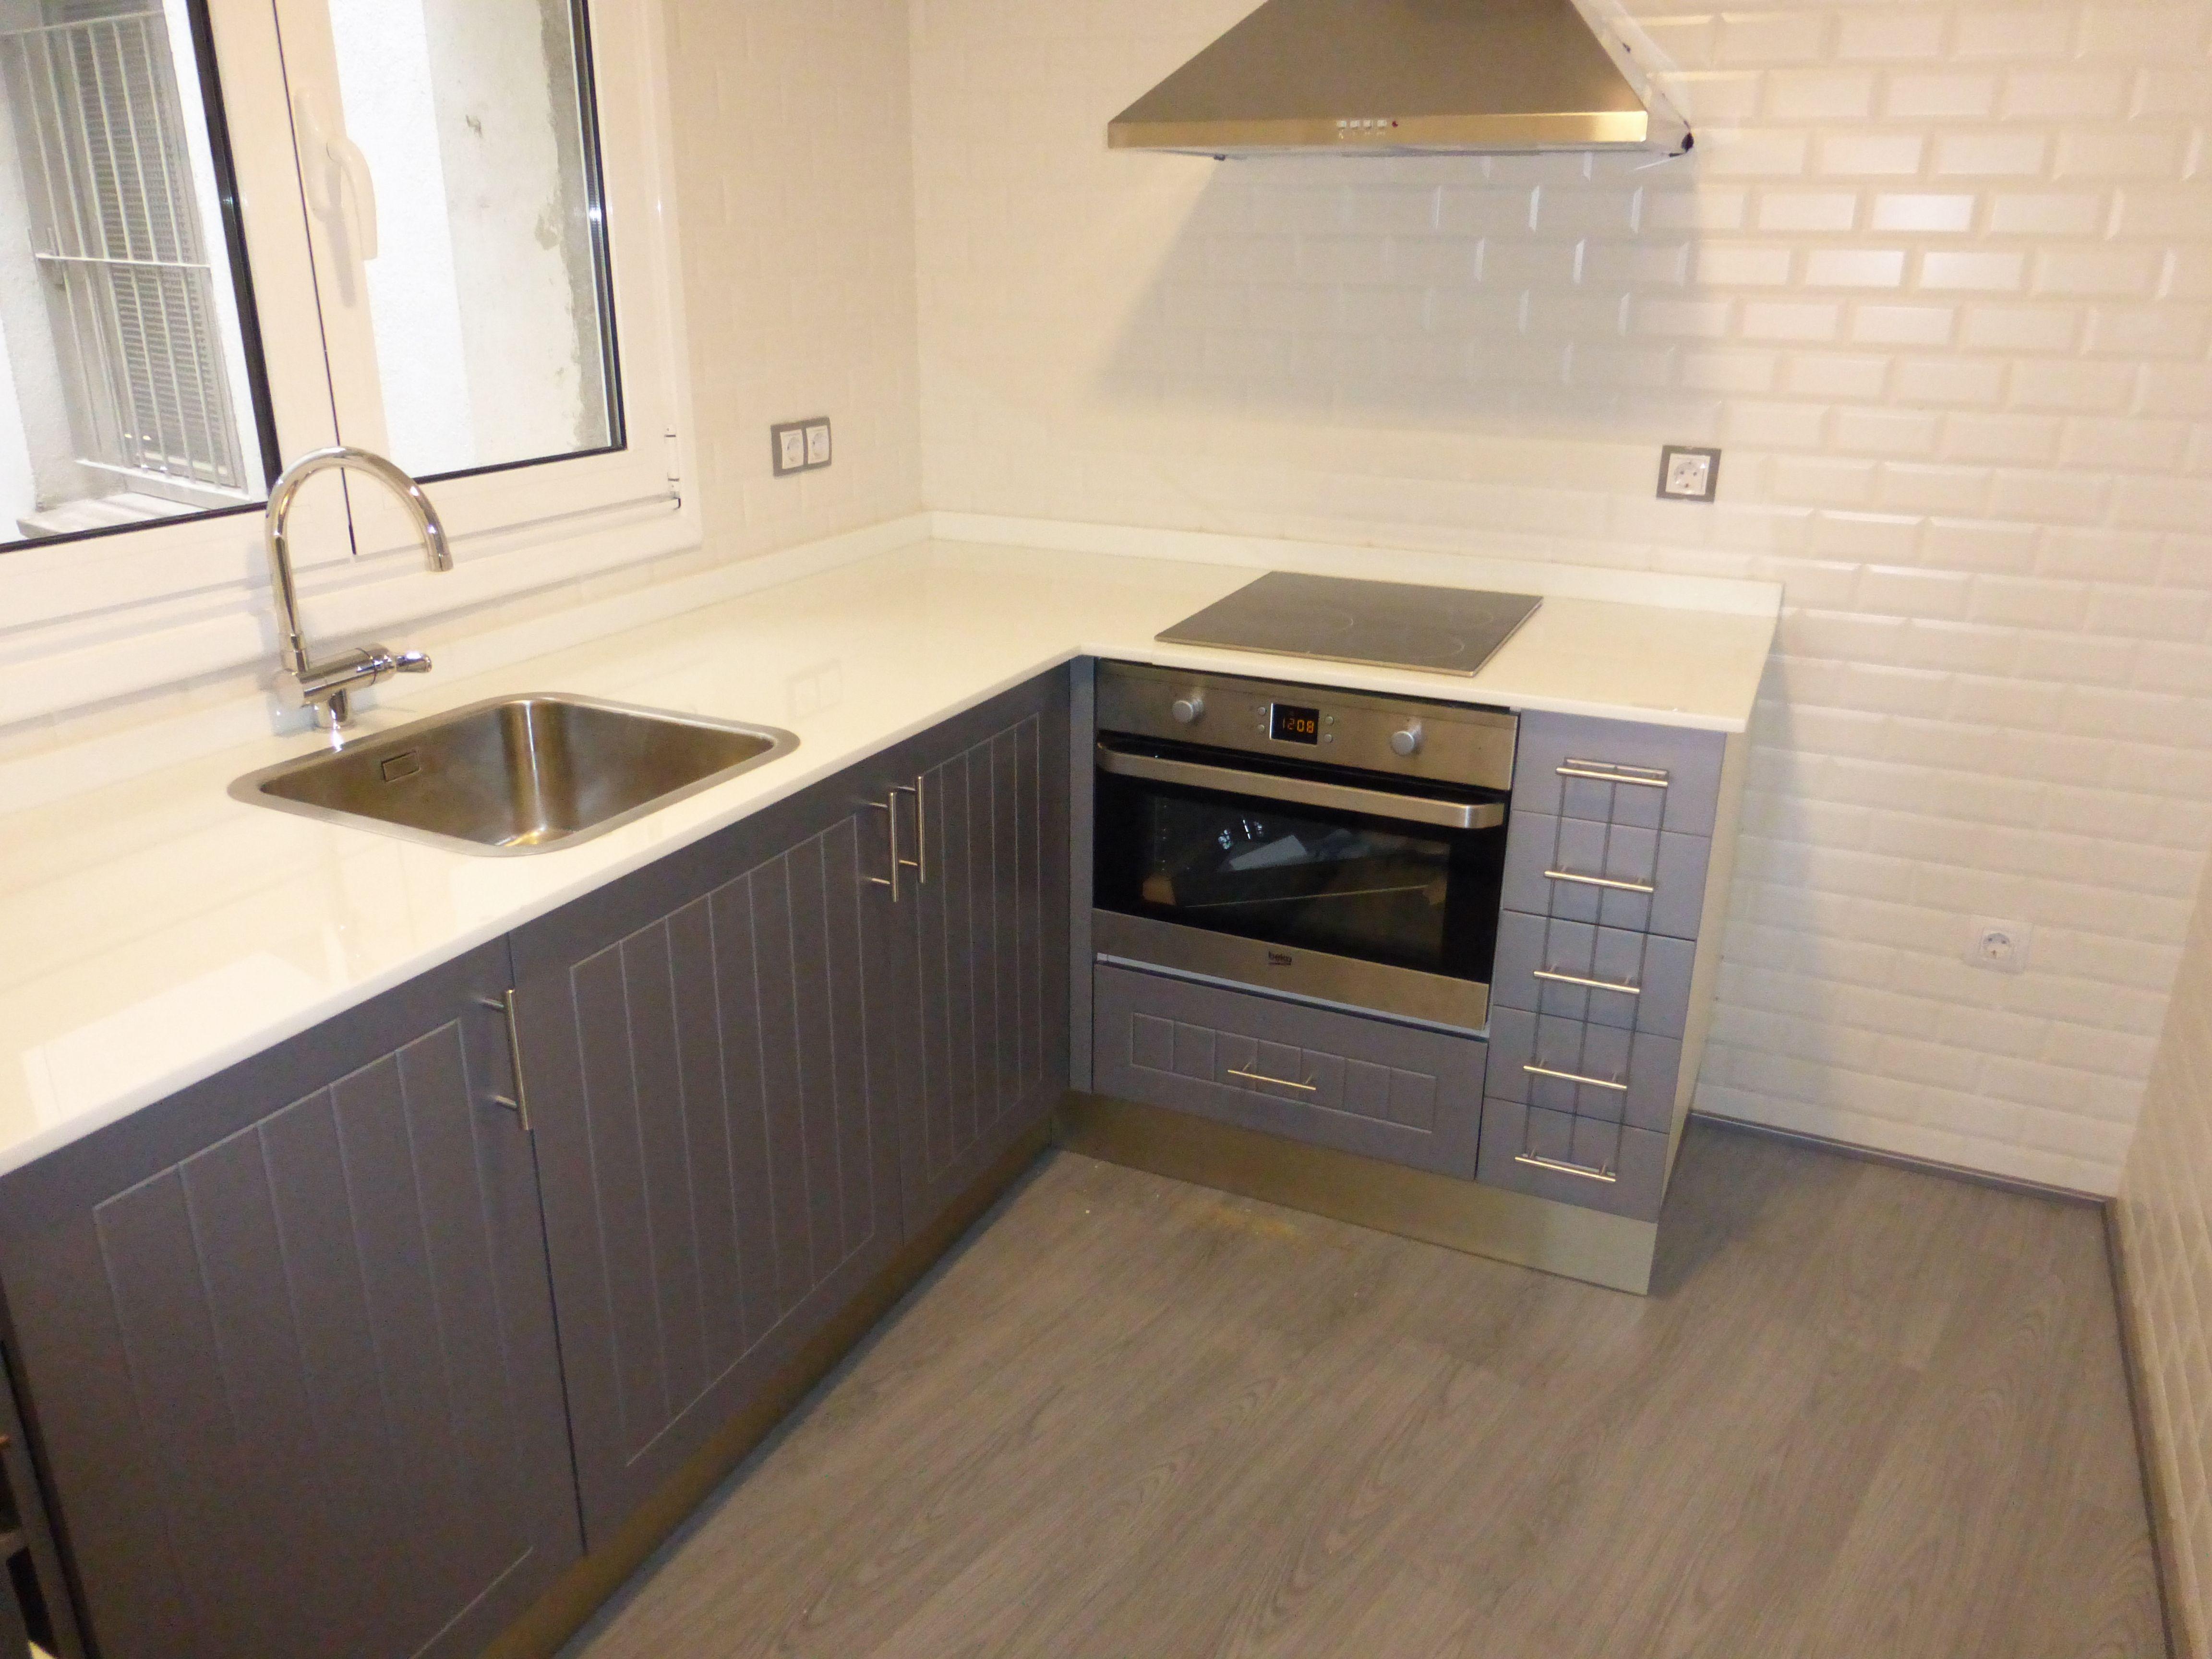 Fabricación e instalación de muebles de cocina